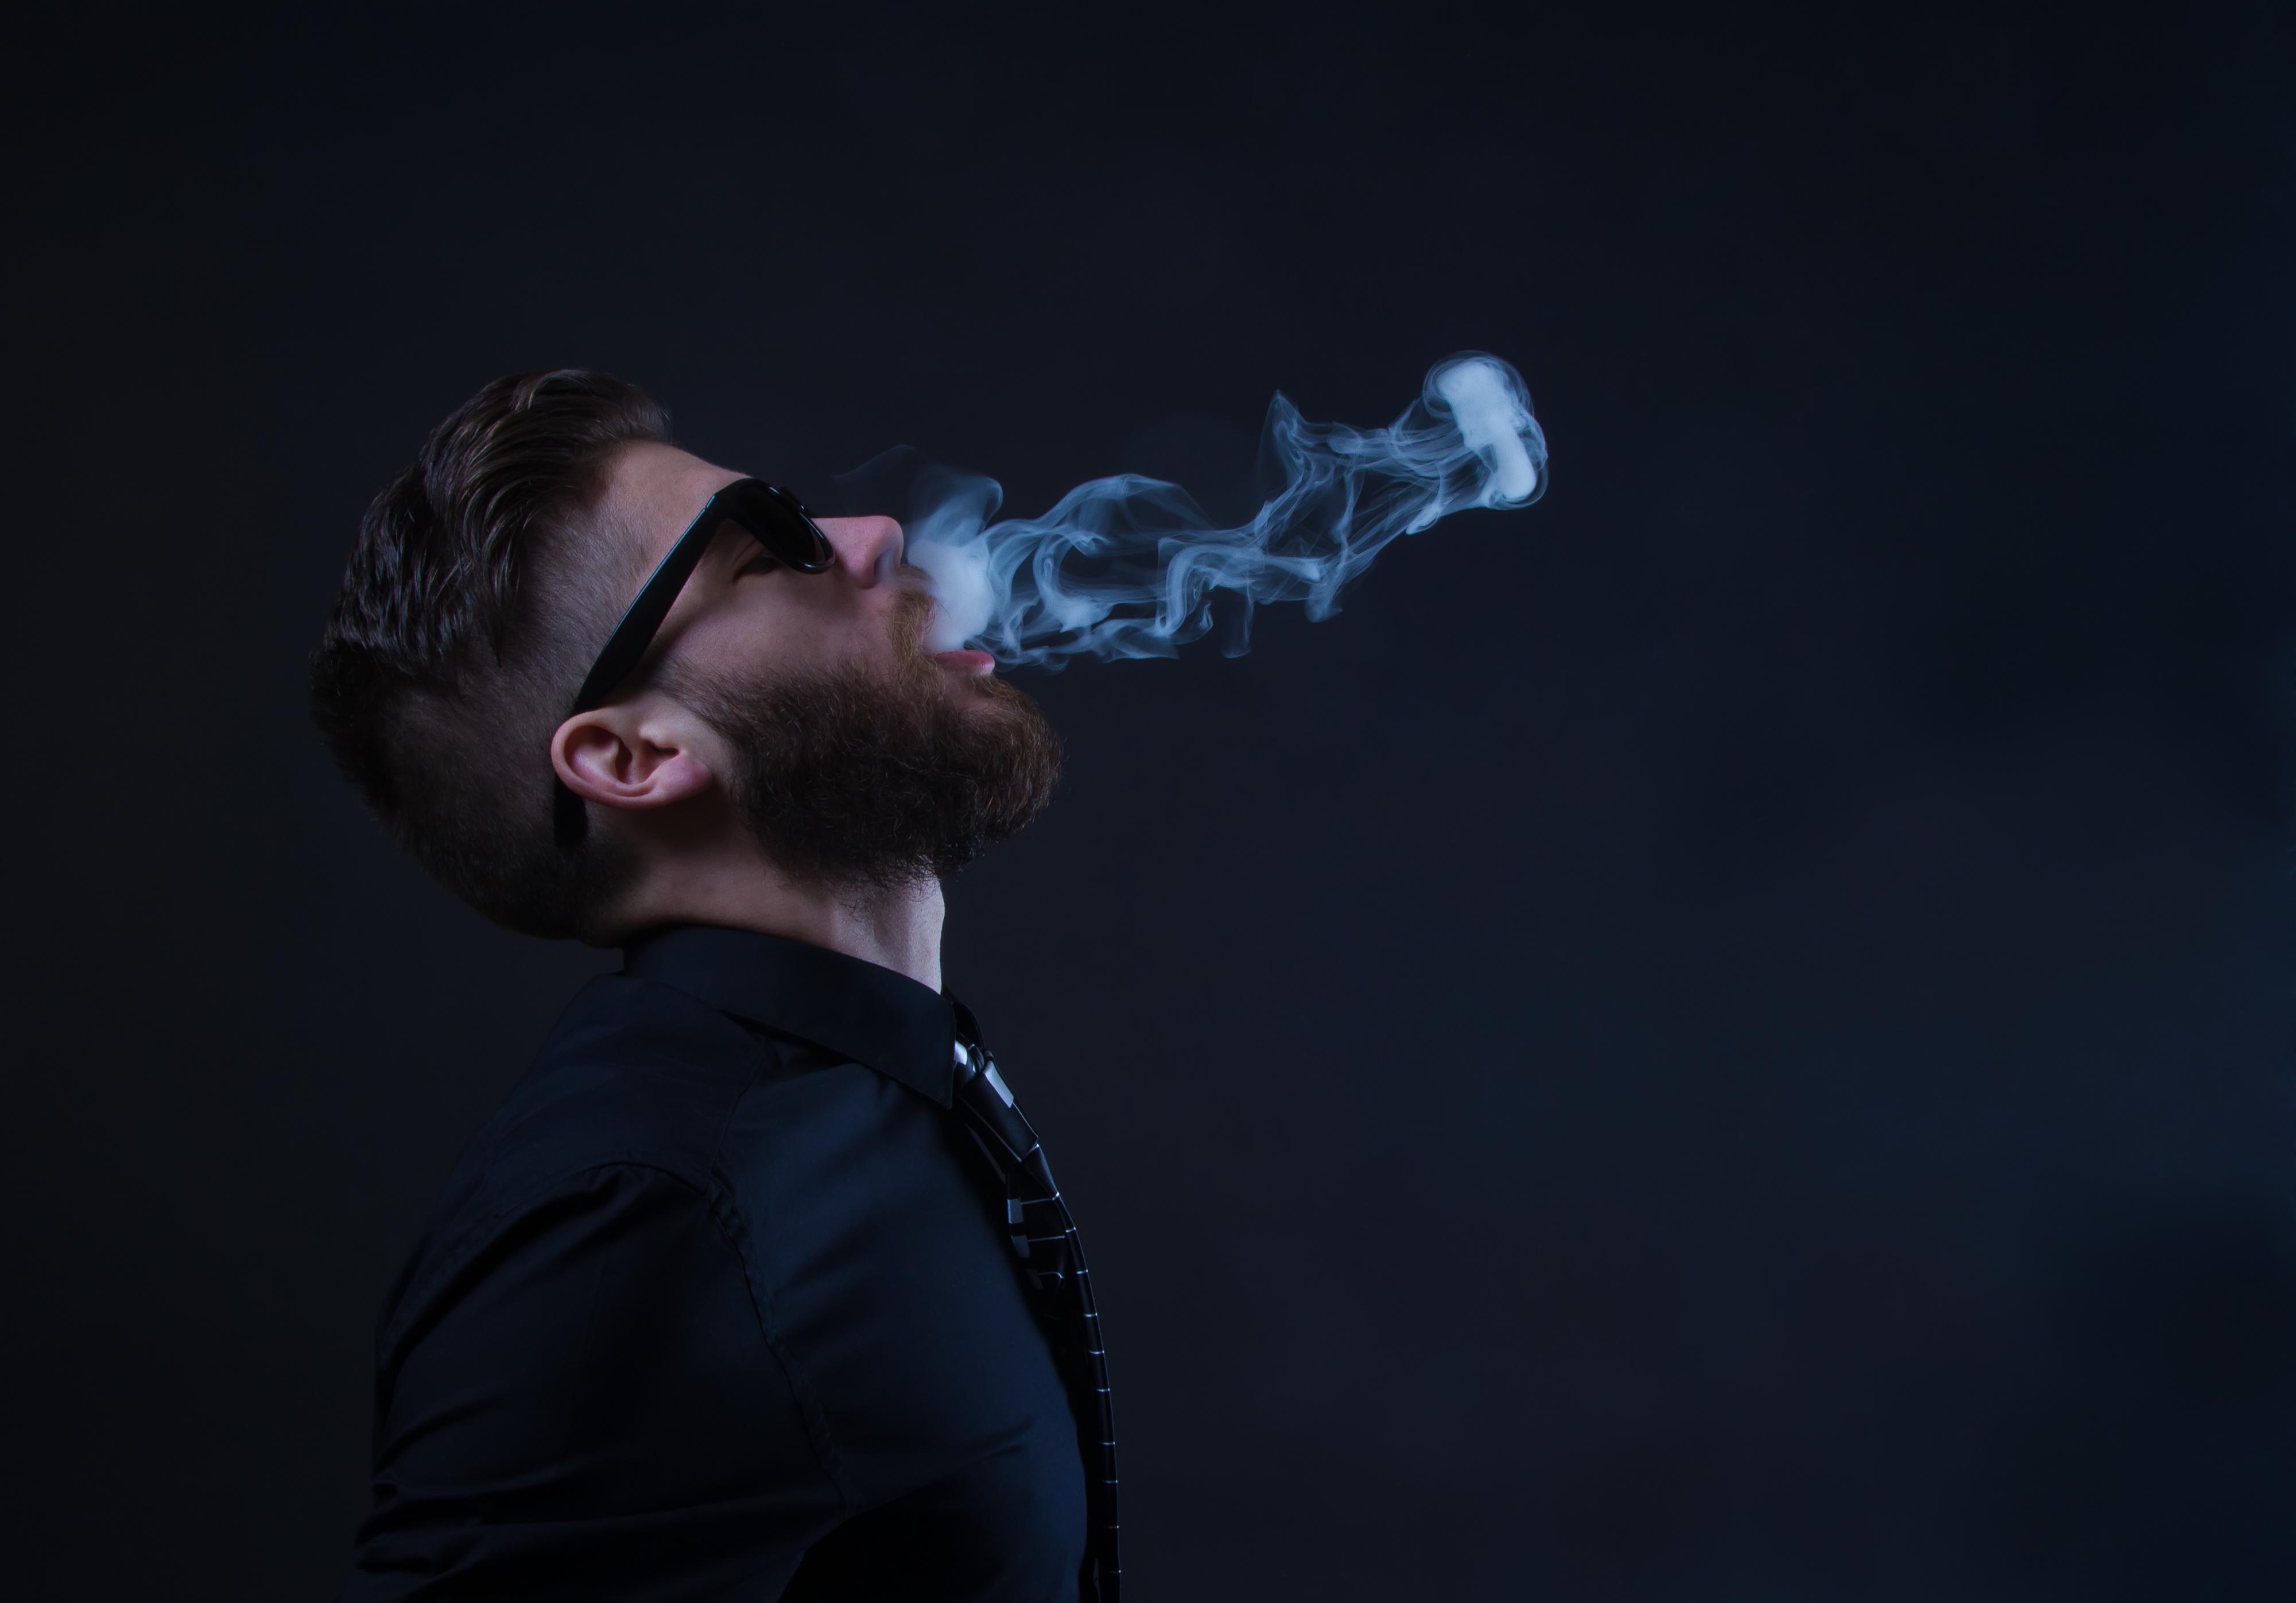 Aurora Cannabis to offer Namaste vaporizers in Canada